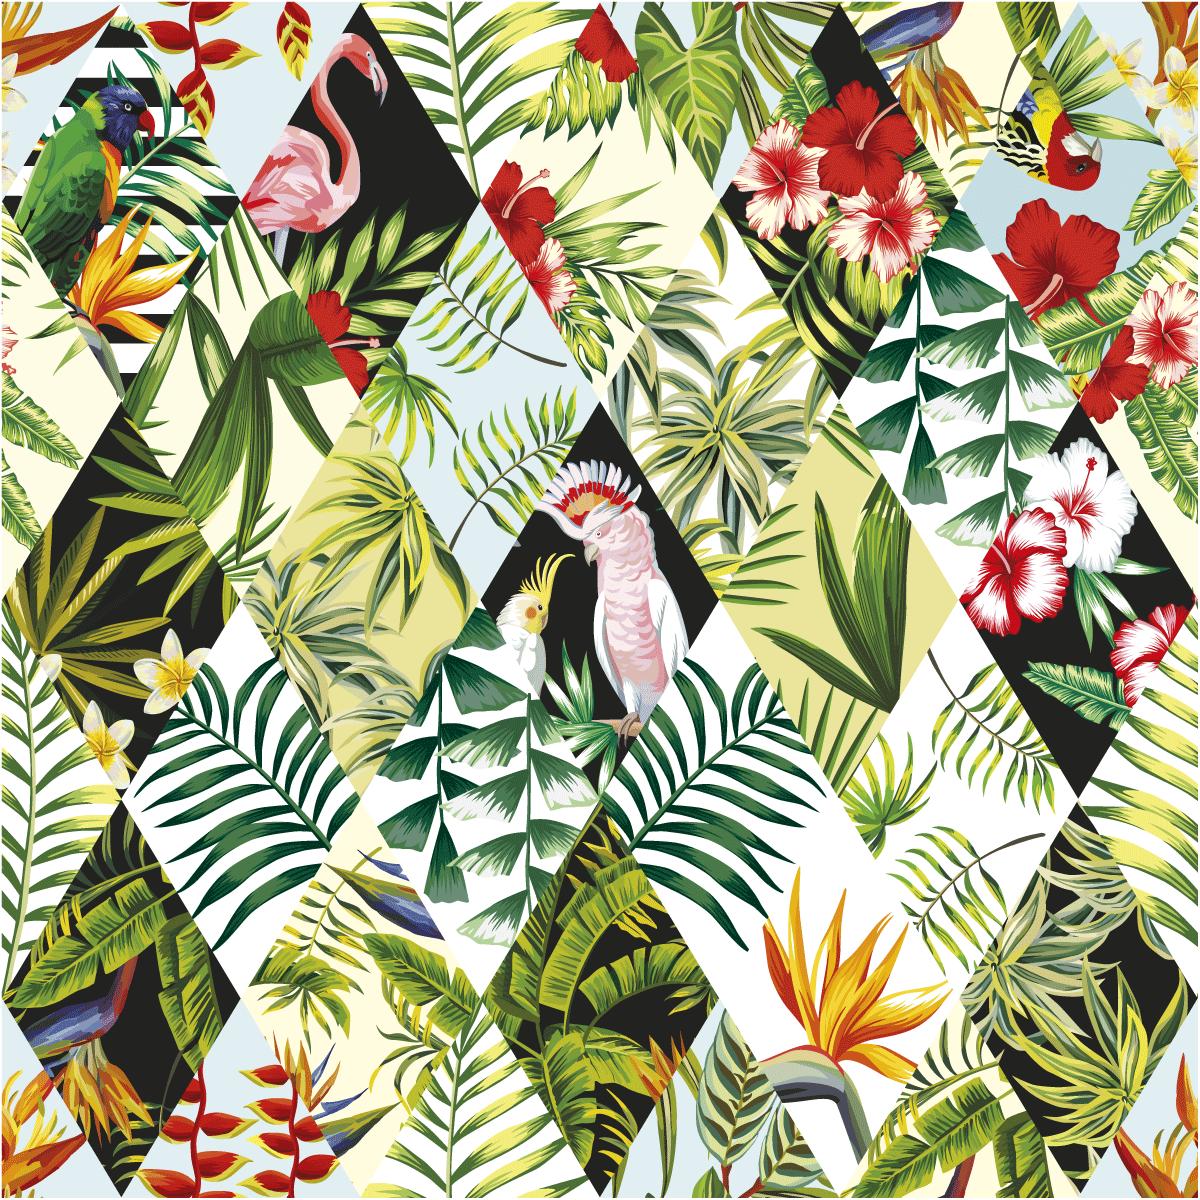 Sticker Papier Peint Tropical Jungle Nature Arbres Ambiance Sticker